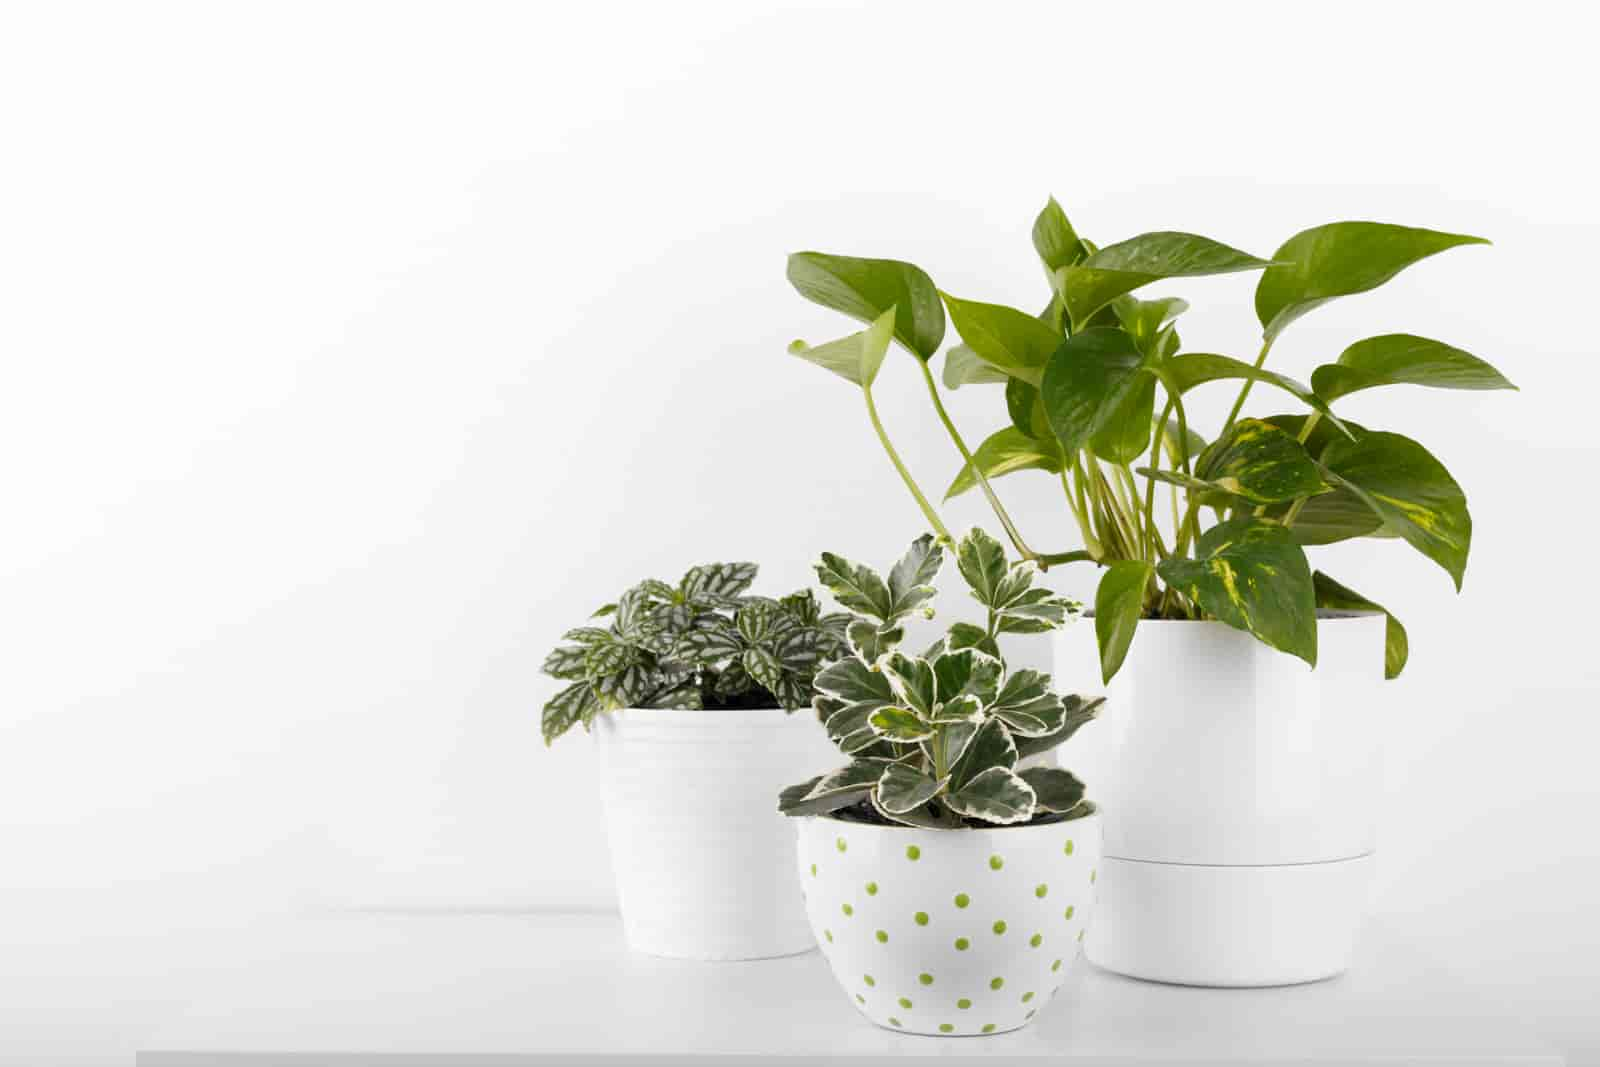 How long can a pothos plant live